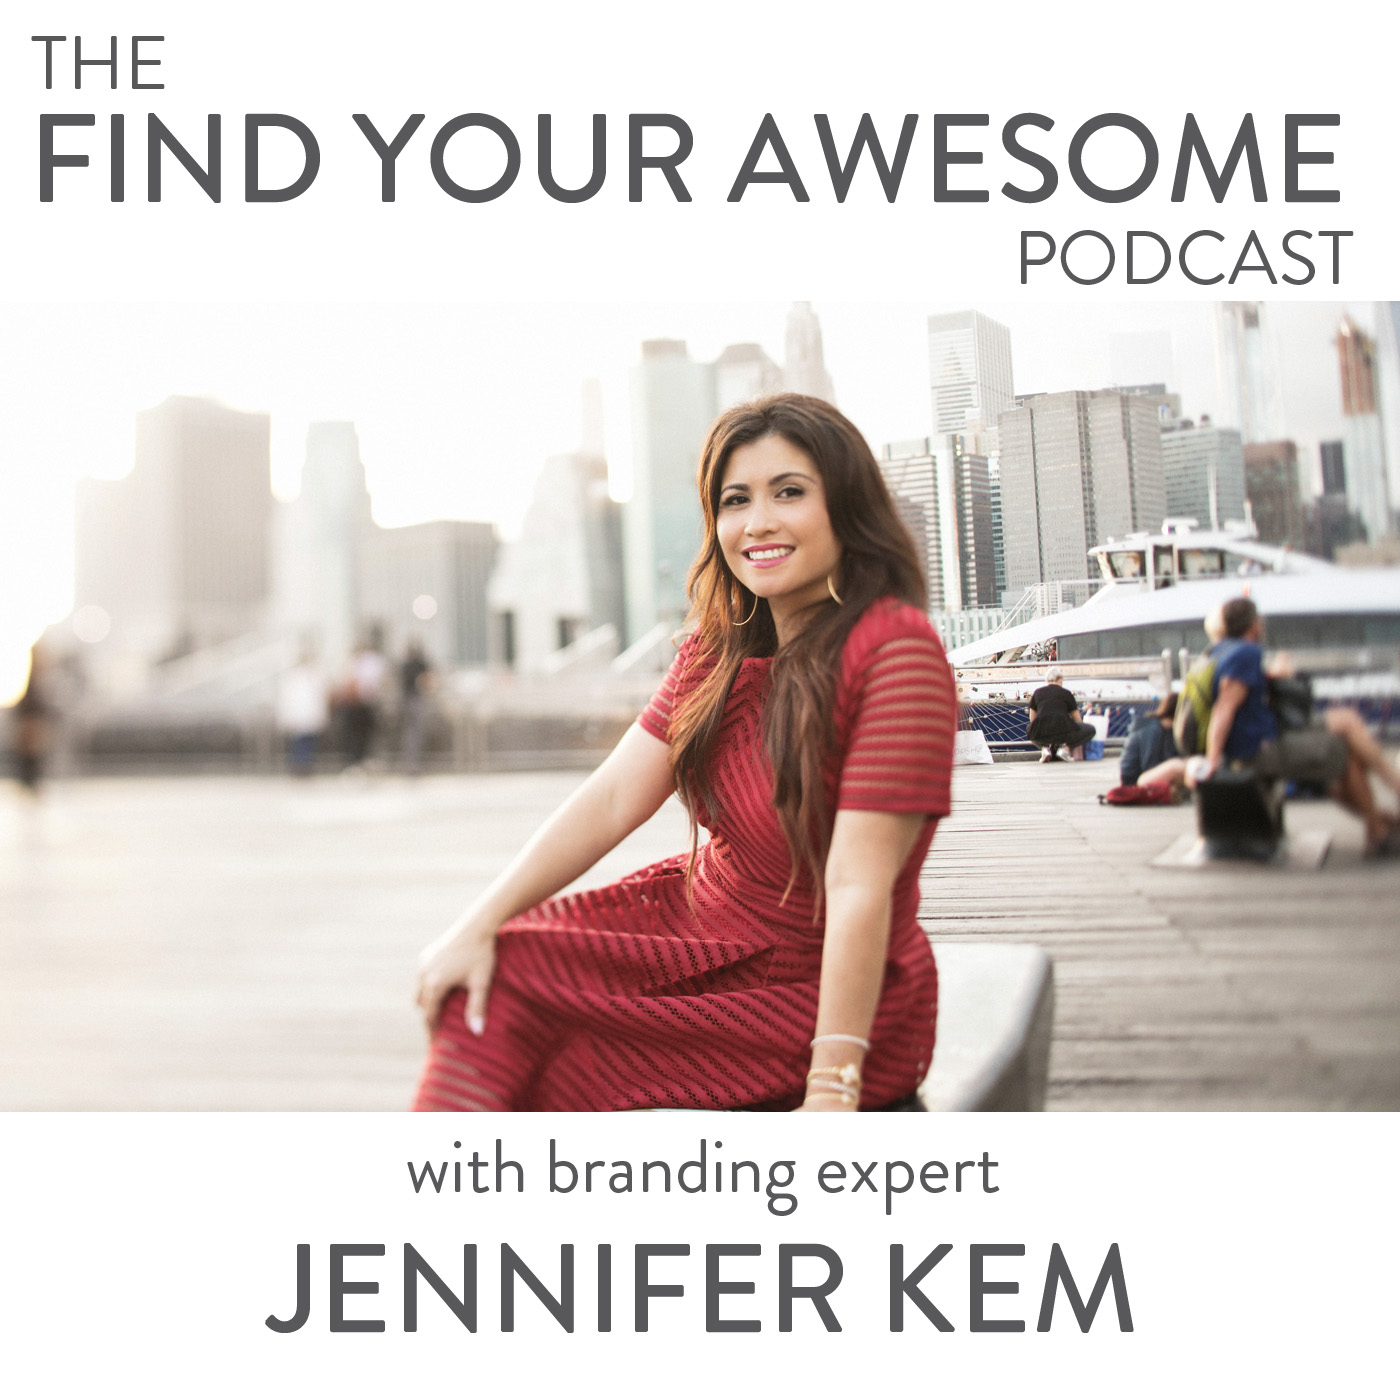 JenniferKem_podcast_coverart.jpg